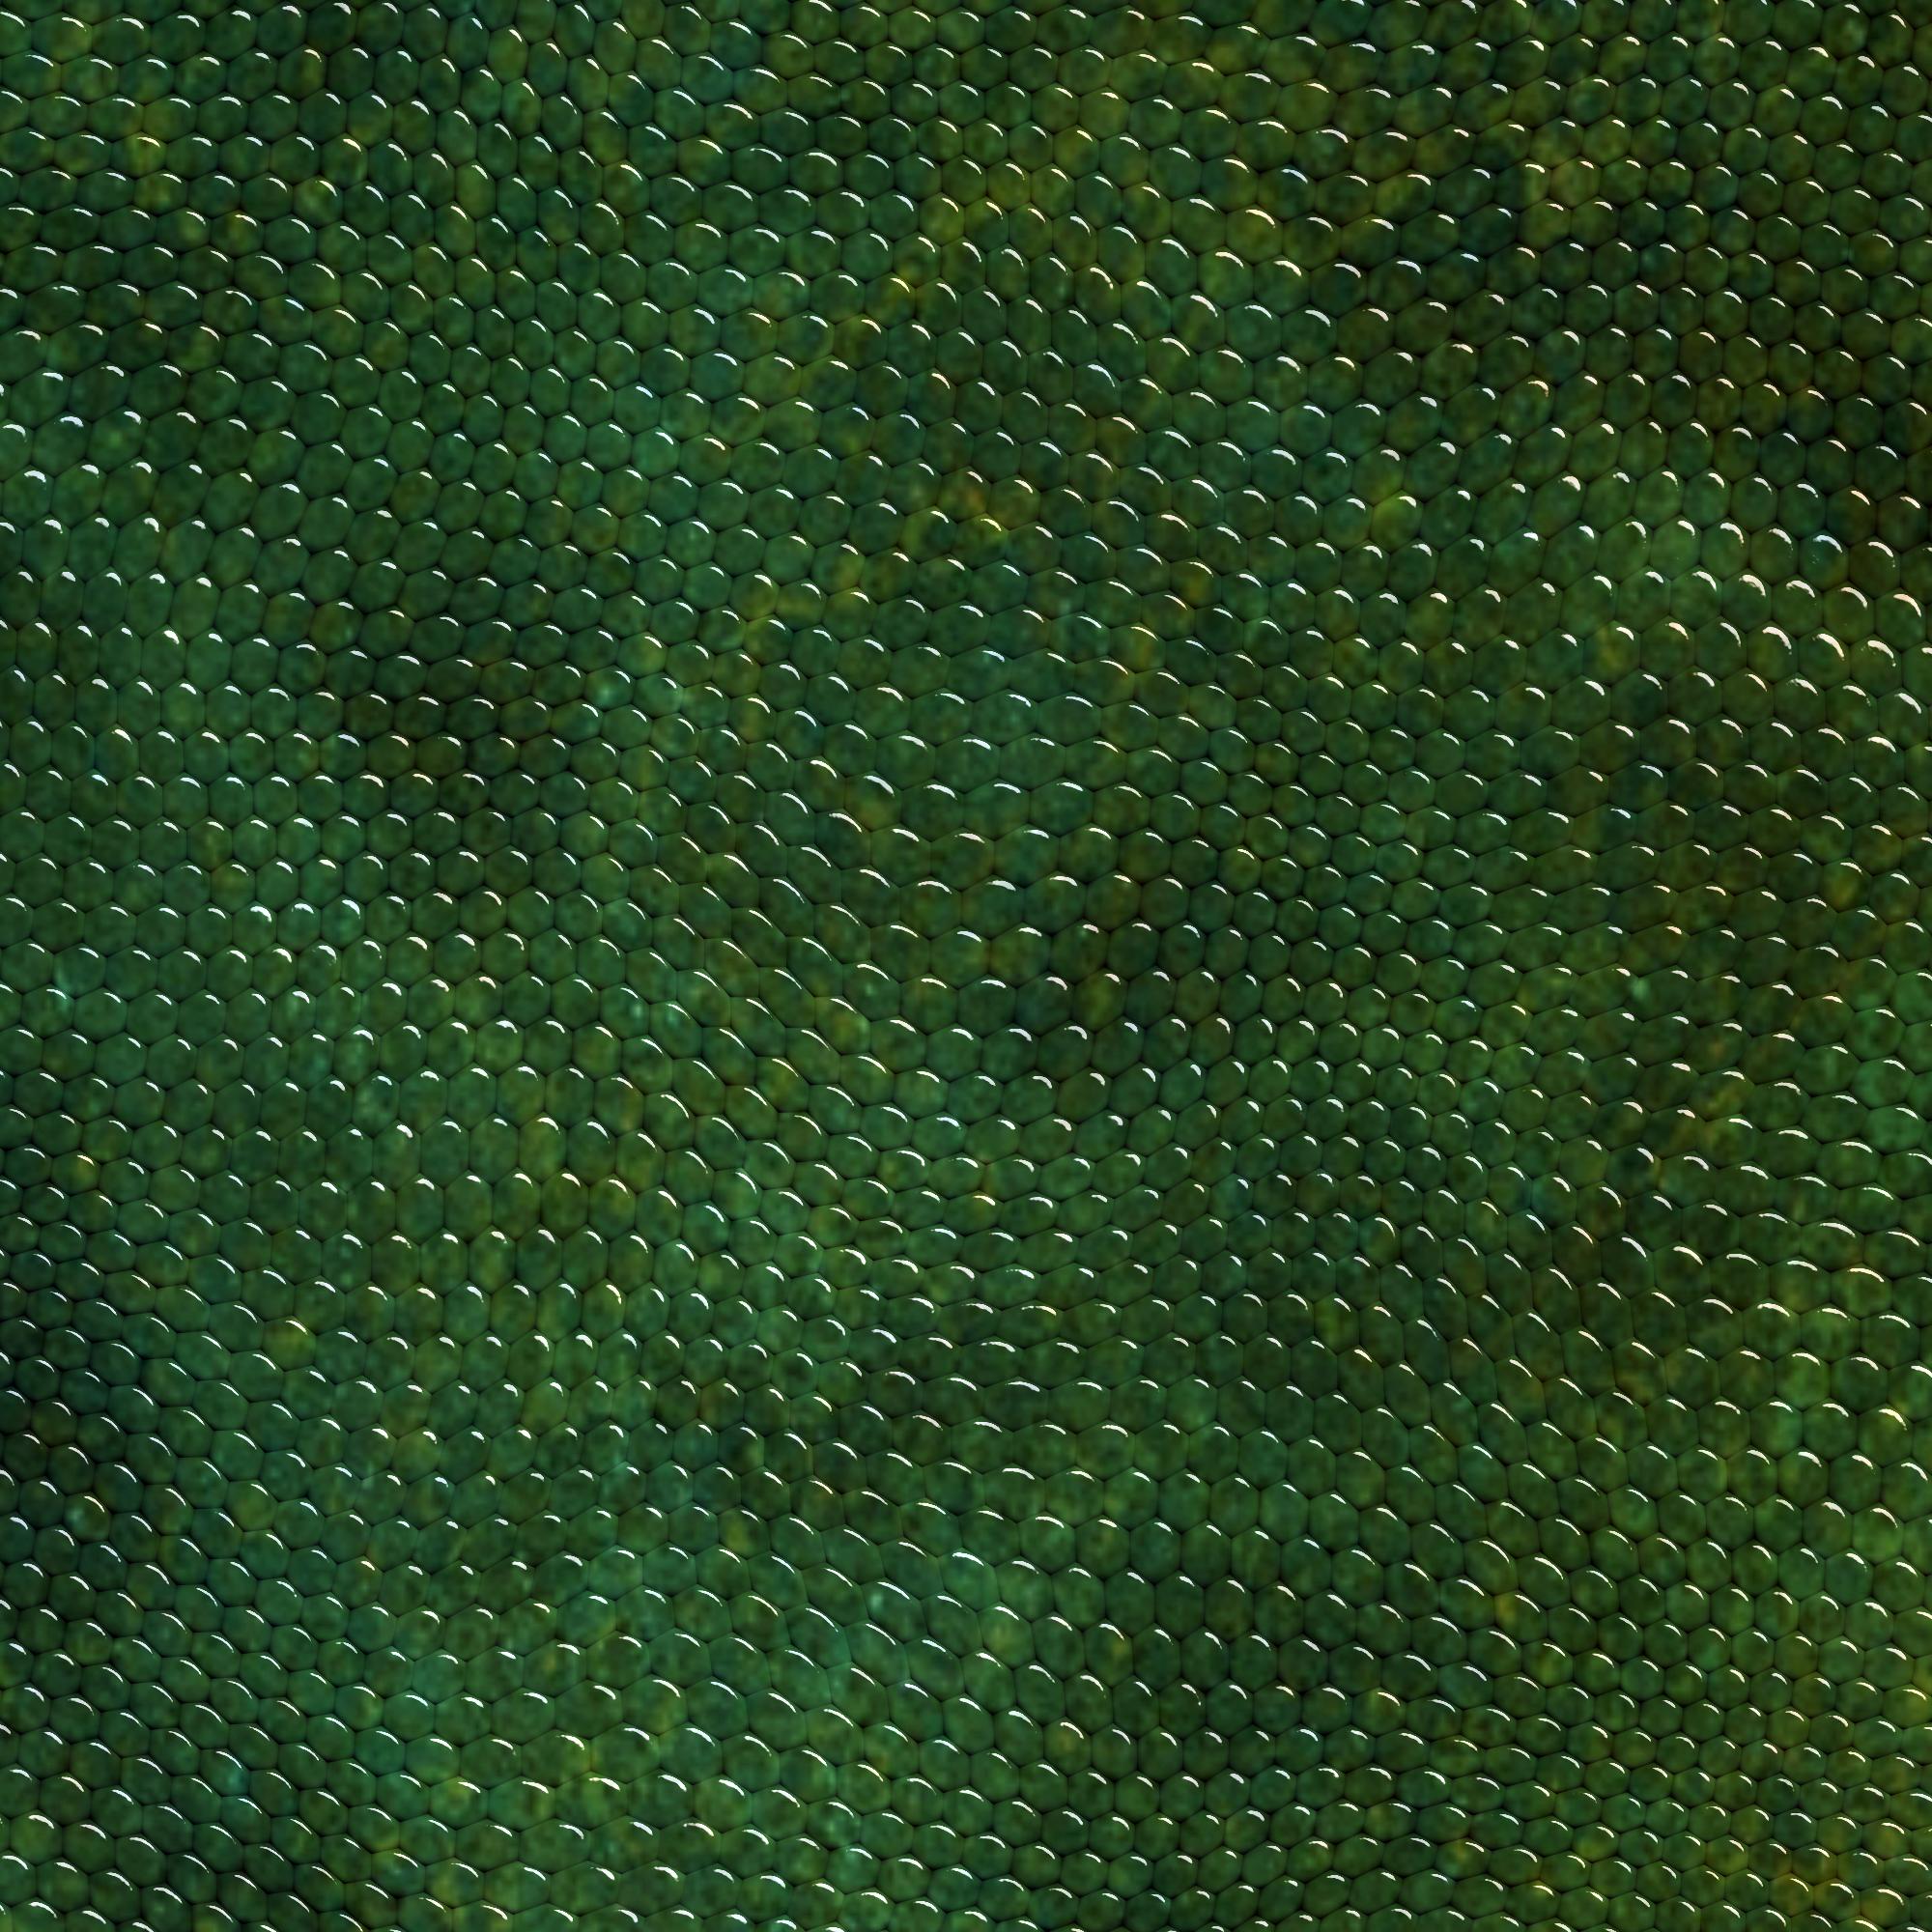 green snakeskin fabric 2000x2000